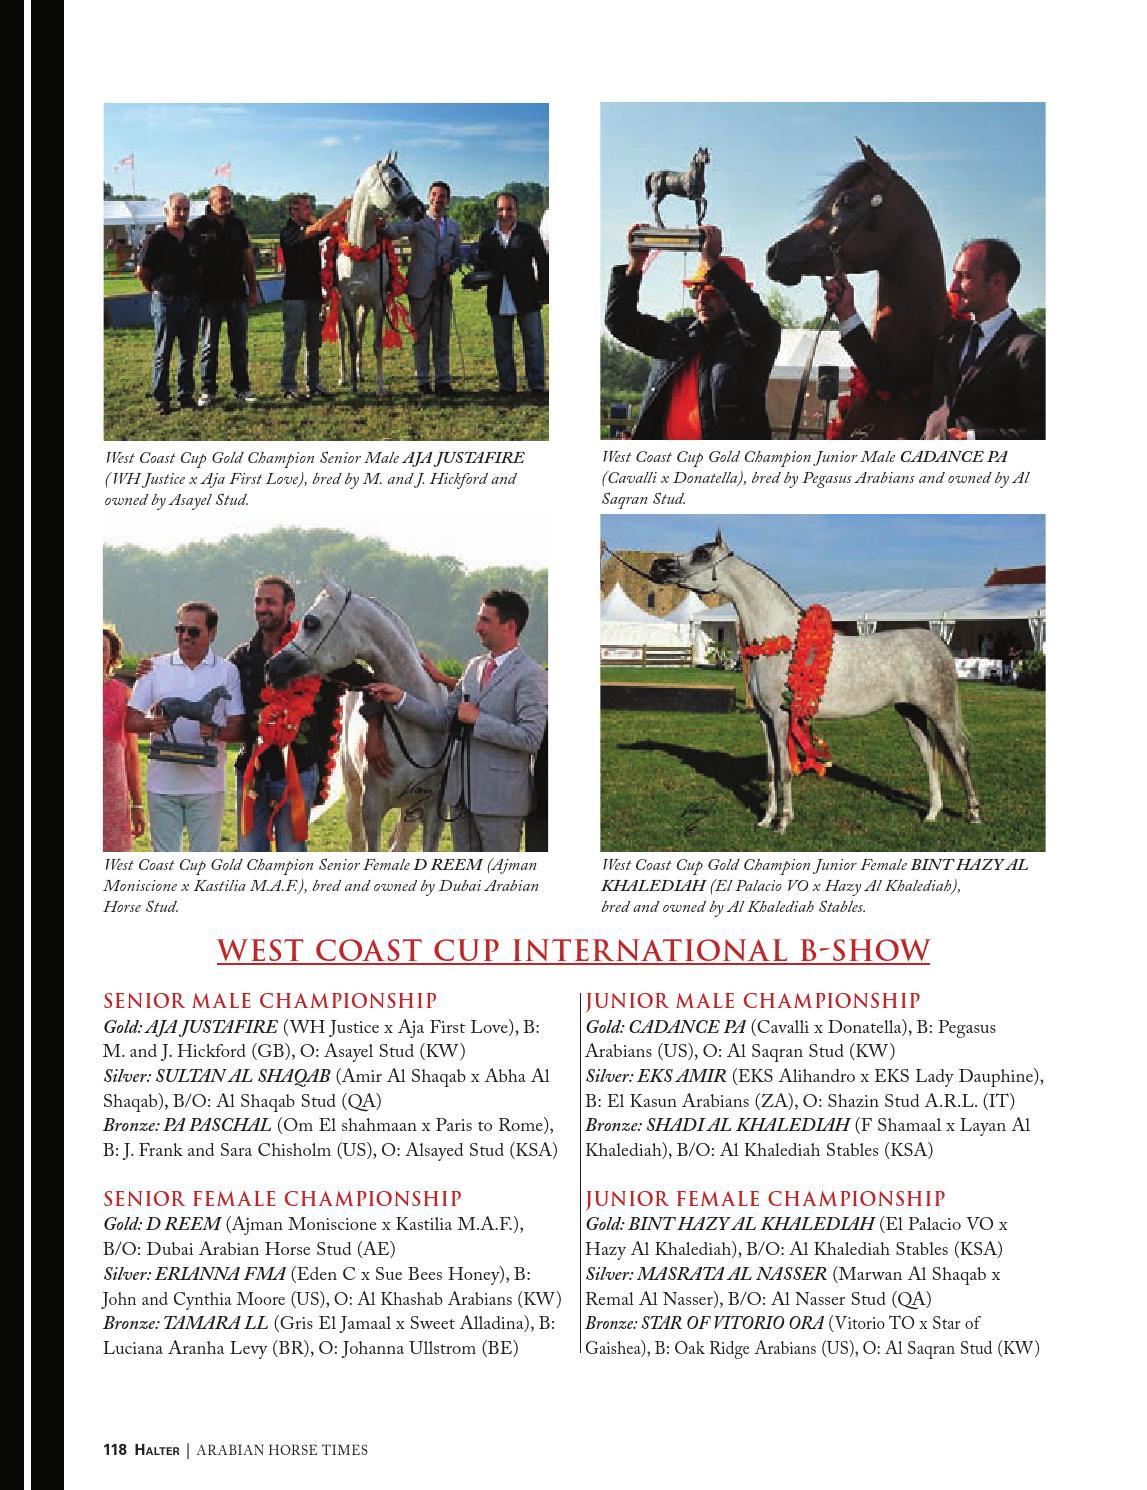 arabian horse times vol 46 no 3 by arabian horse times issuu